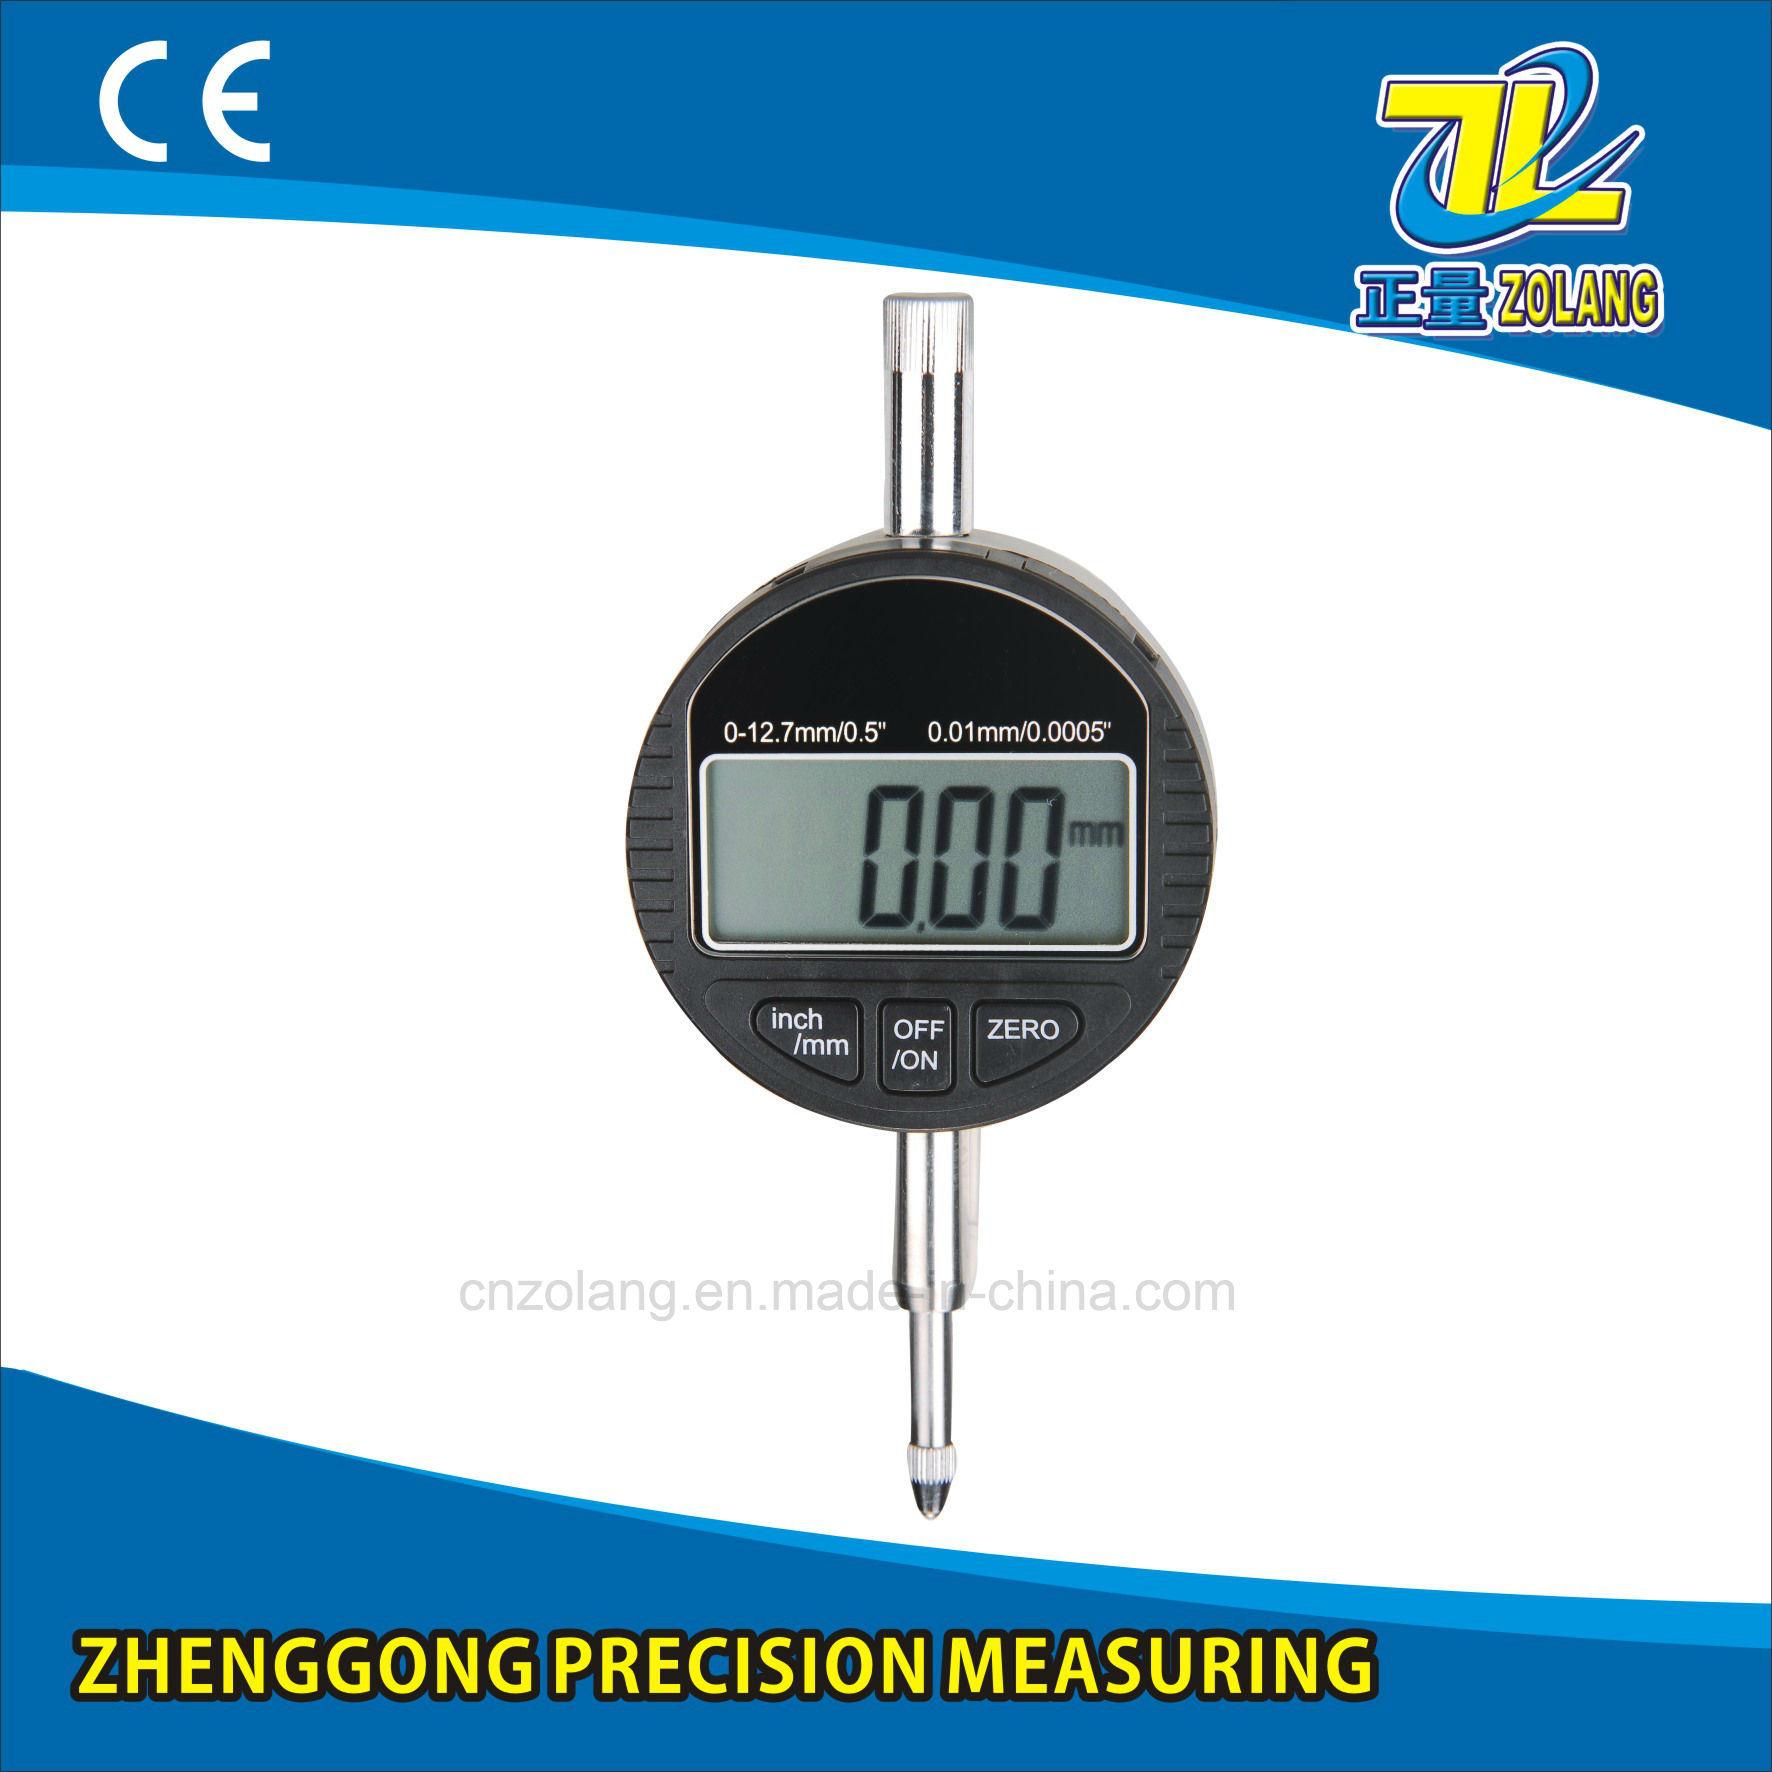 High Accuracy Measuring Tool Digital Indicators/Micron Digital Indicators 0-12.7mm/0-25.4mm